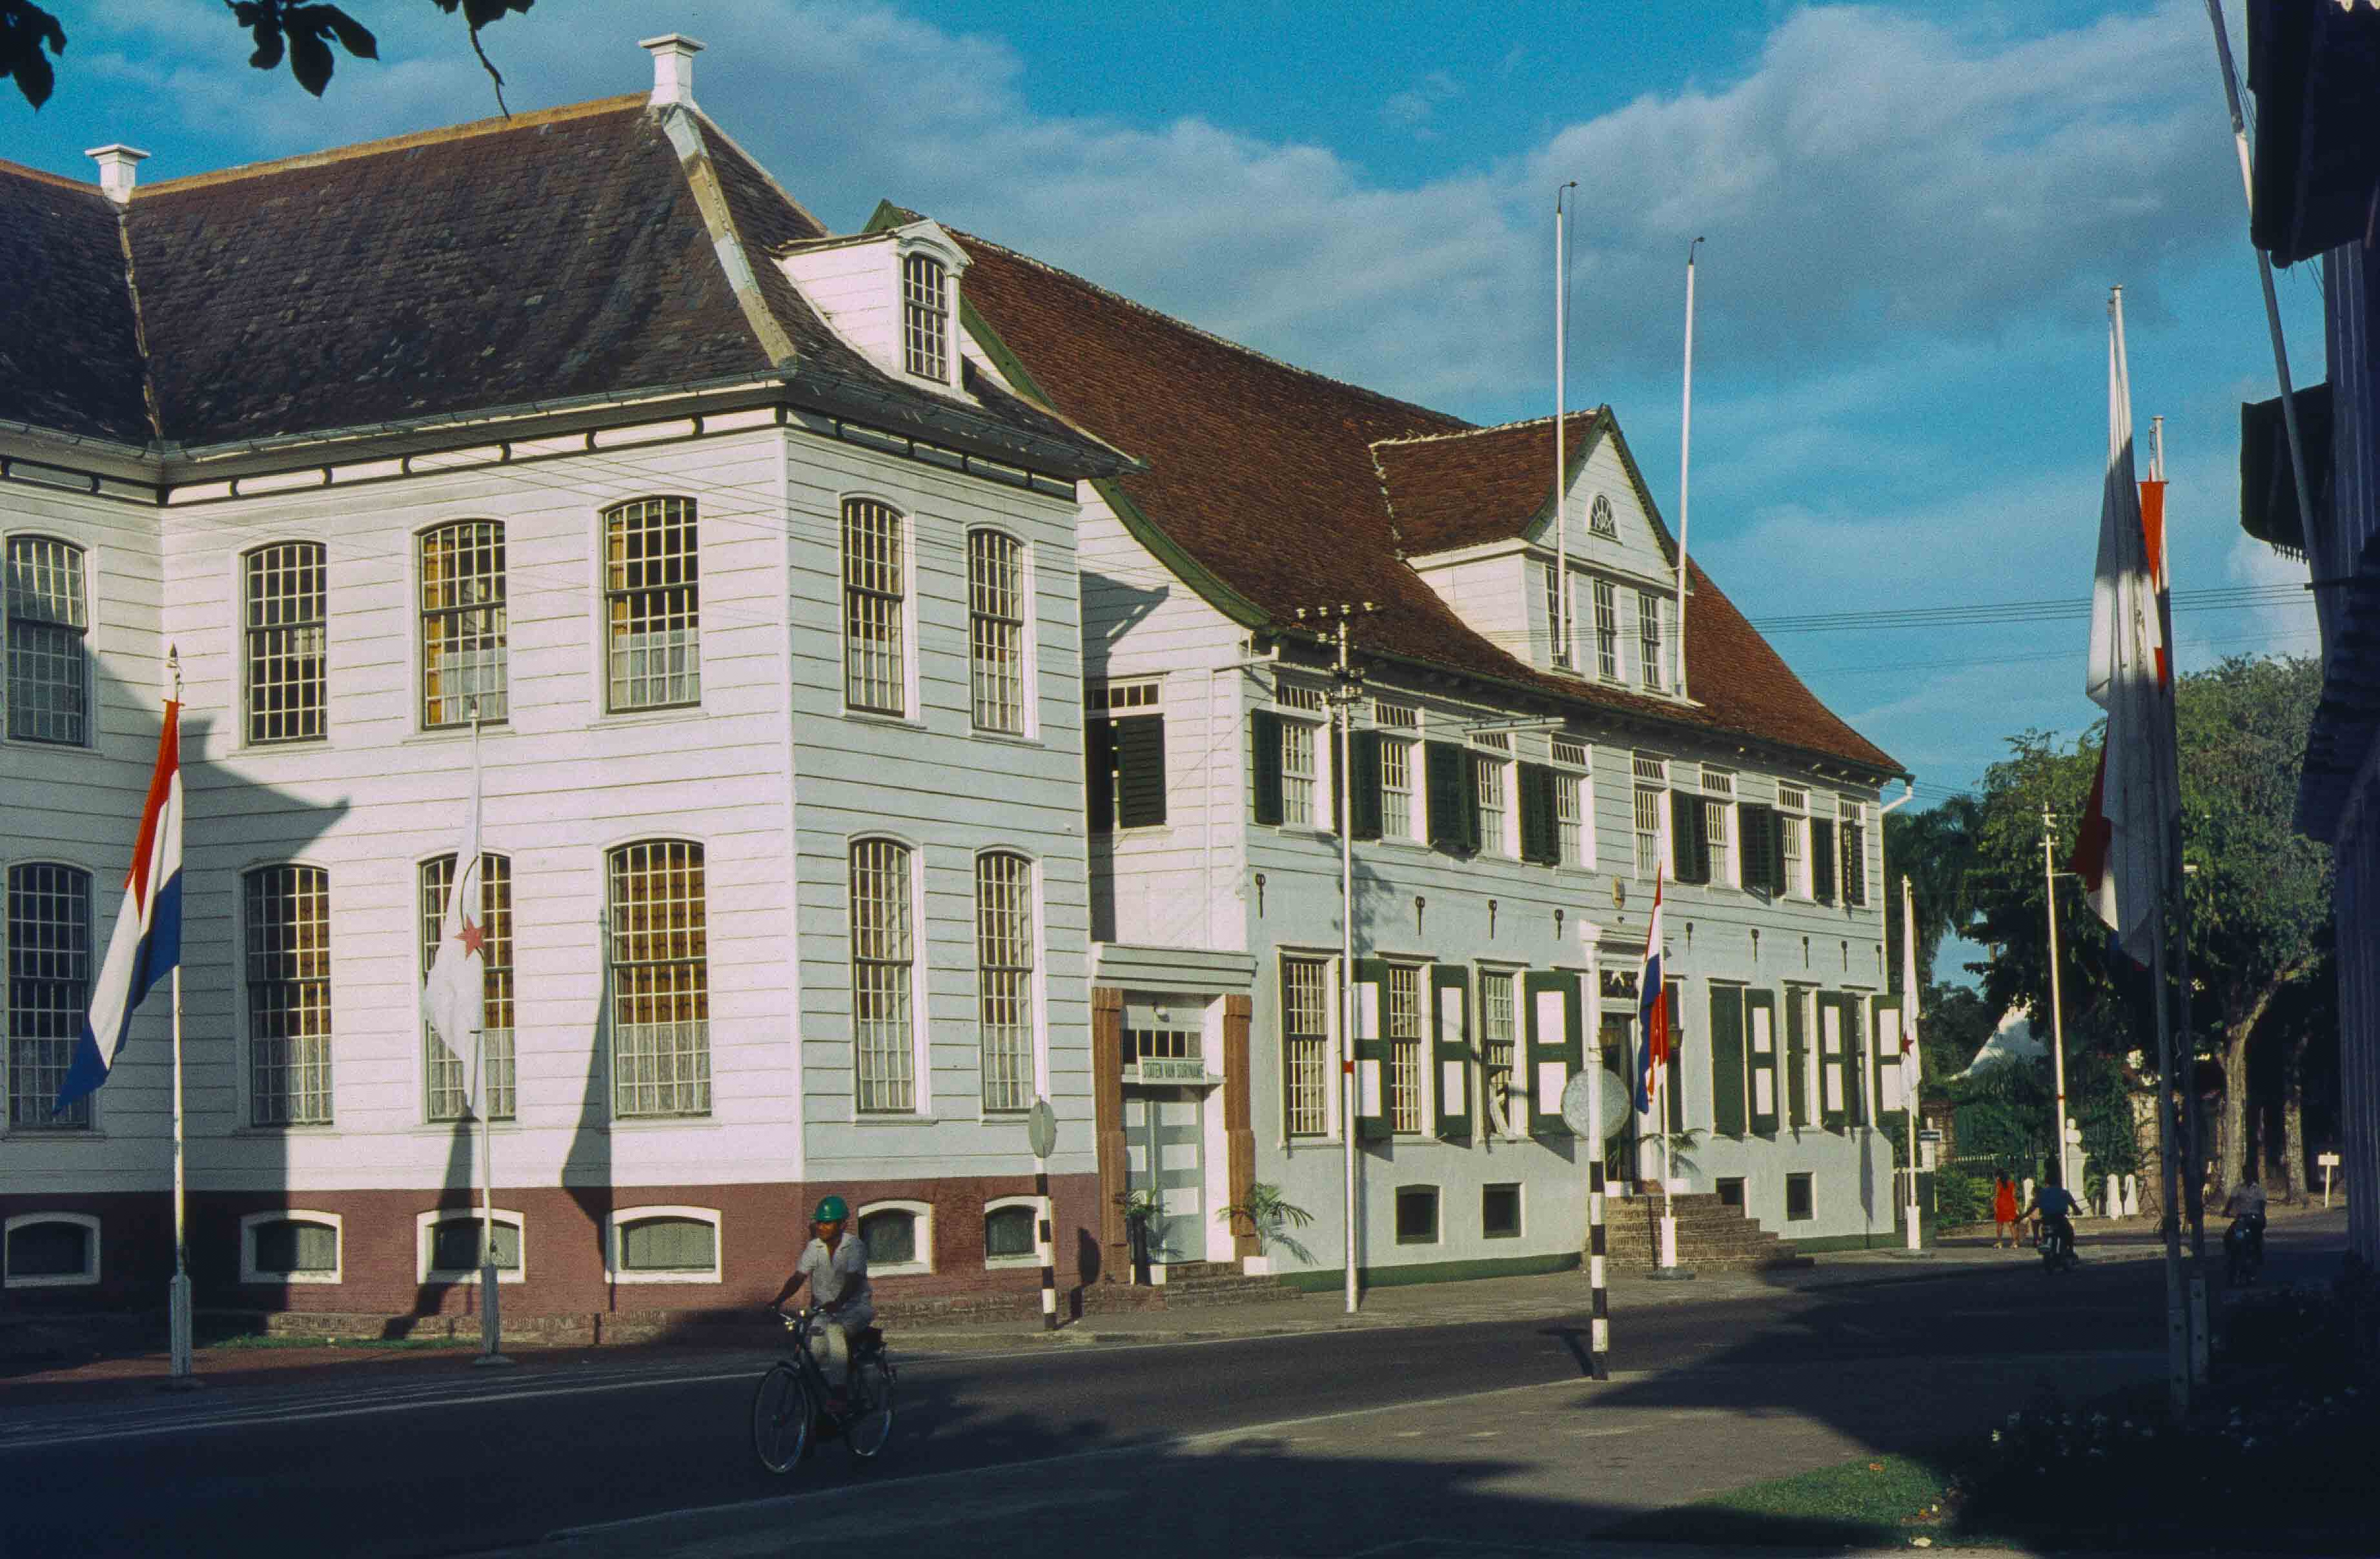 154. Suriname